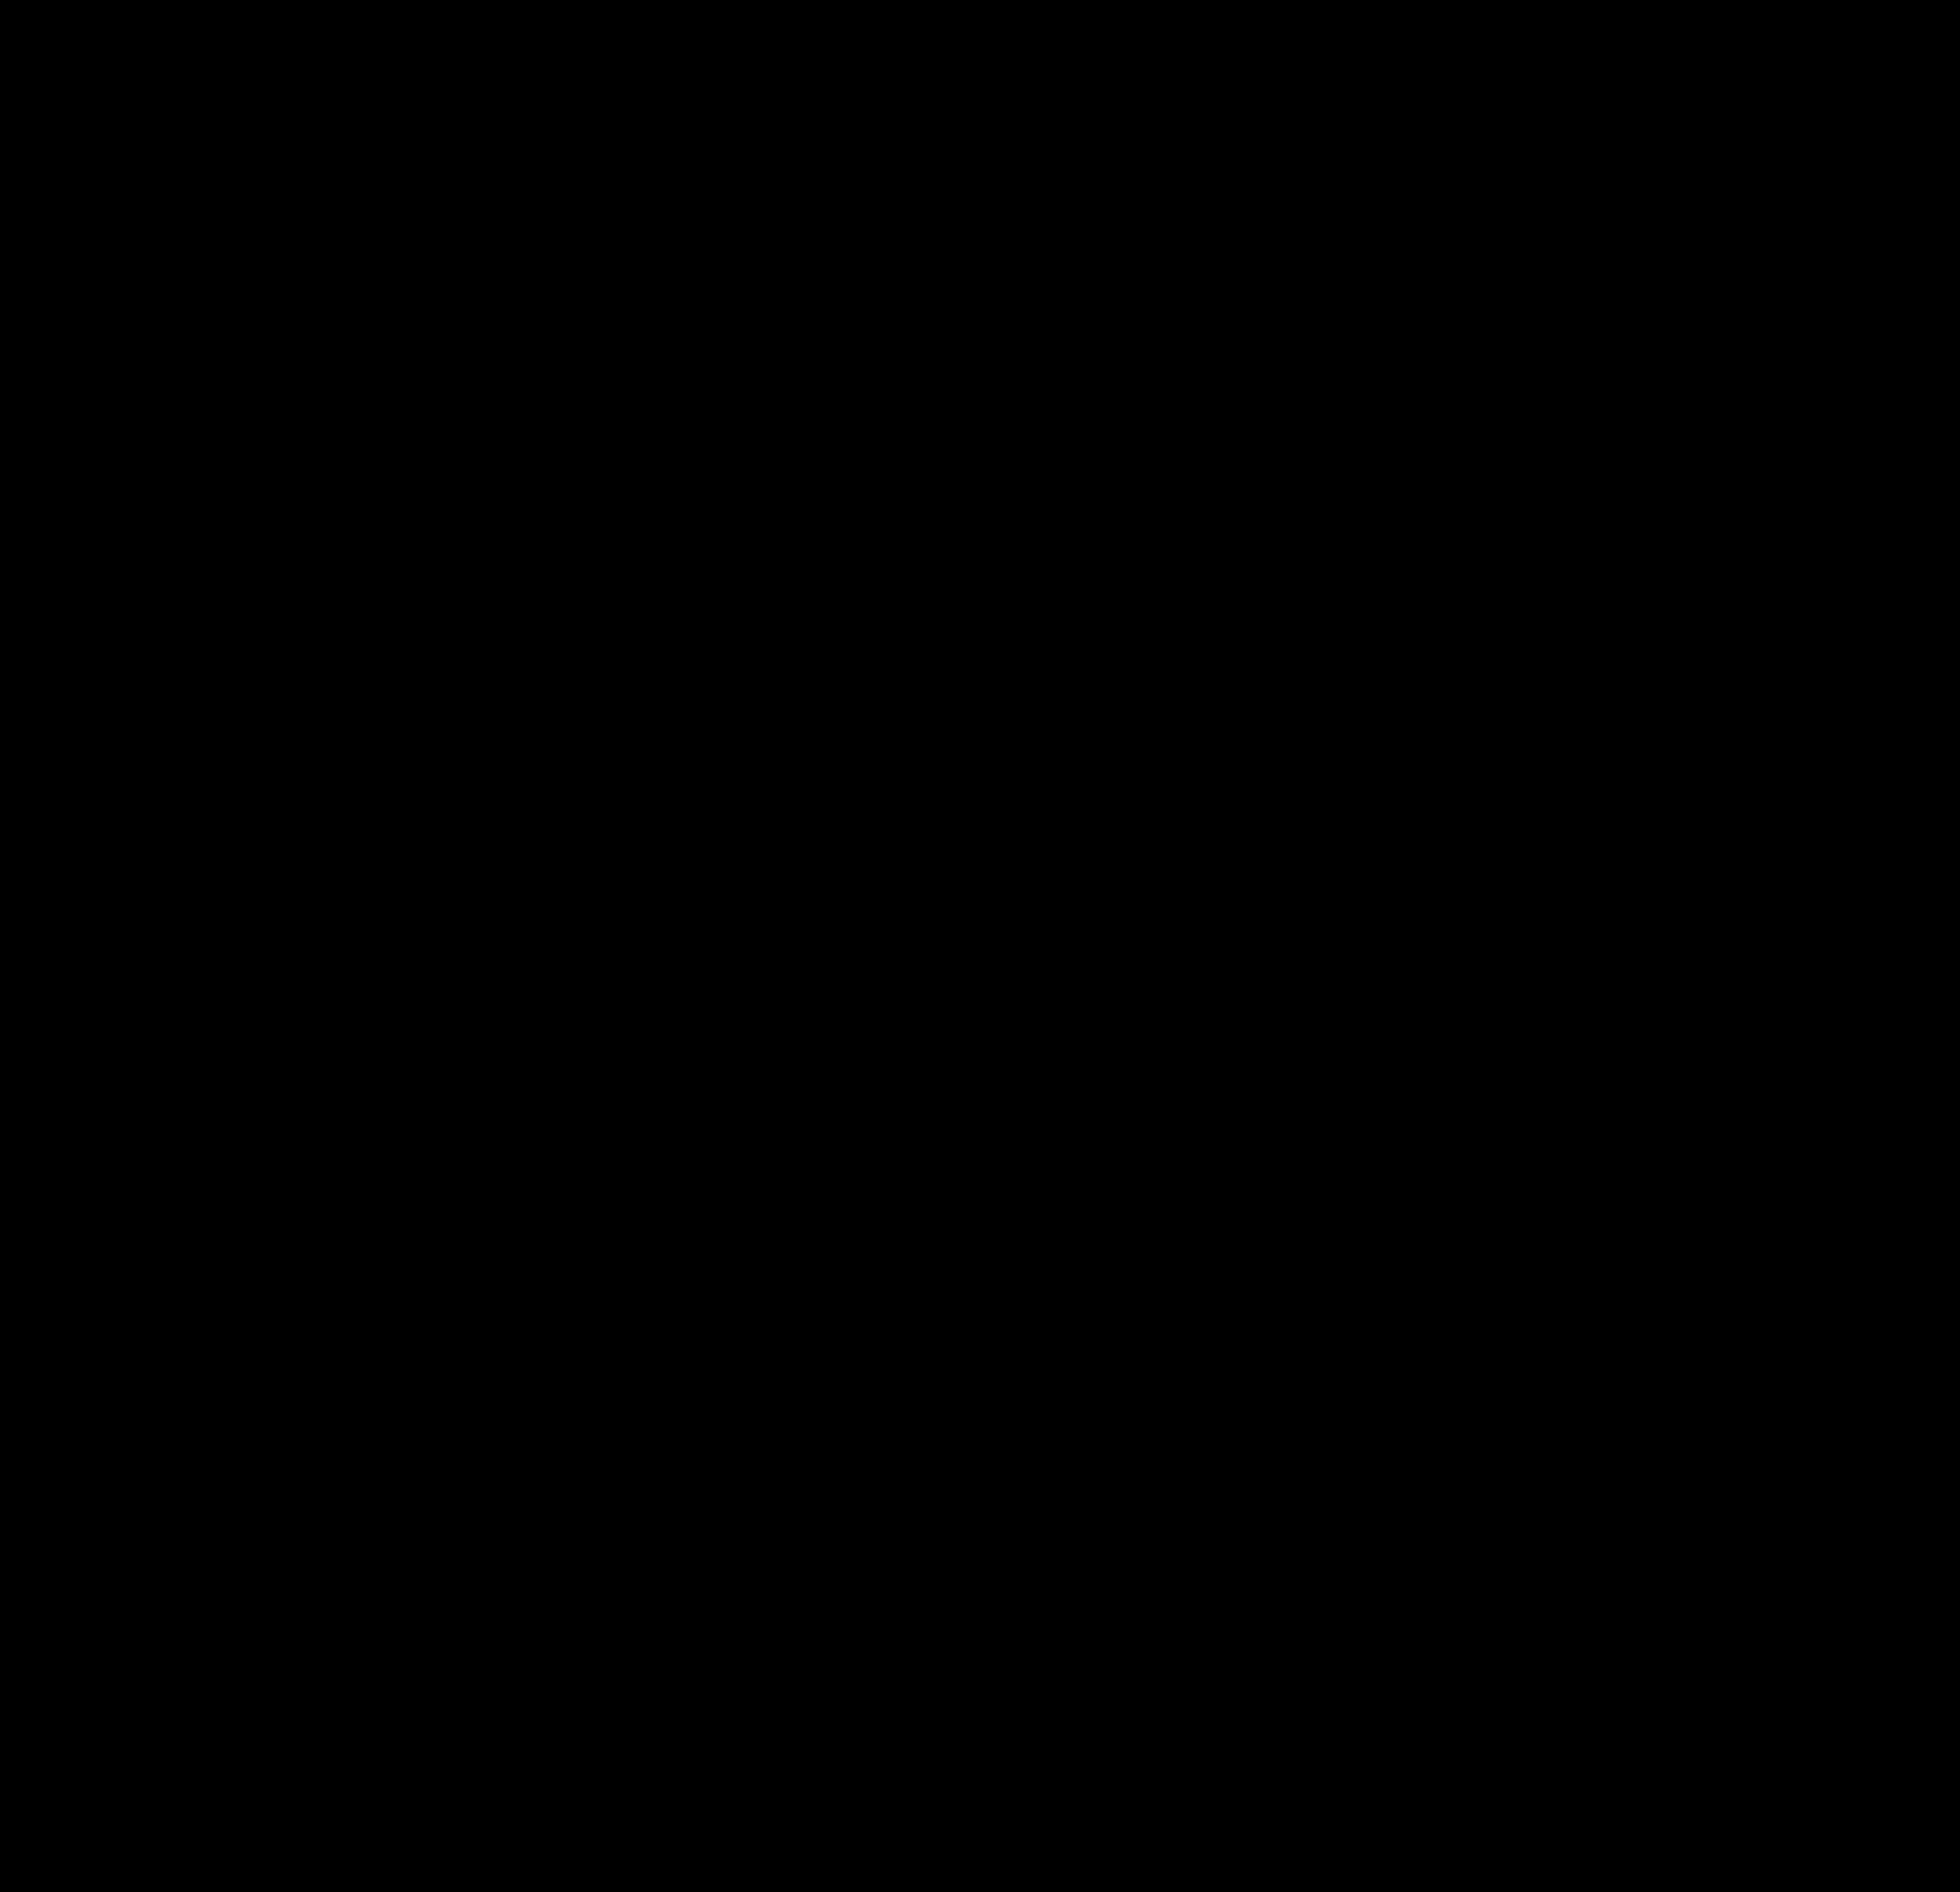 STARmat Wall (Wall target + Laser set)